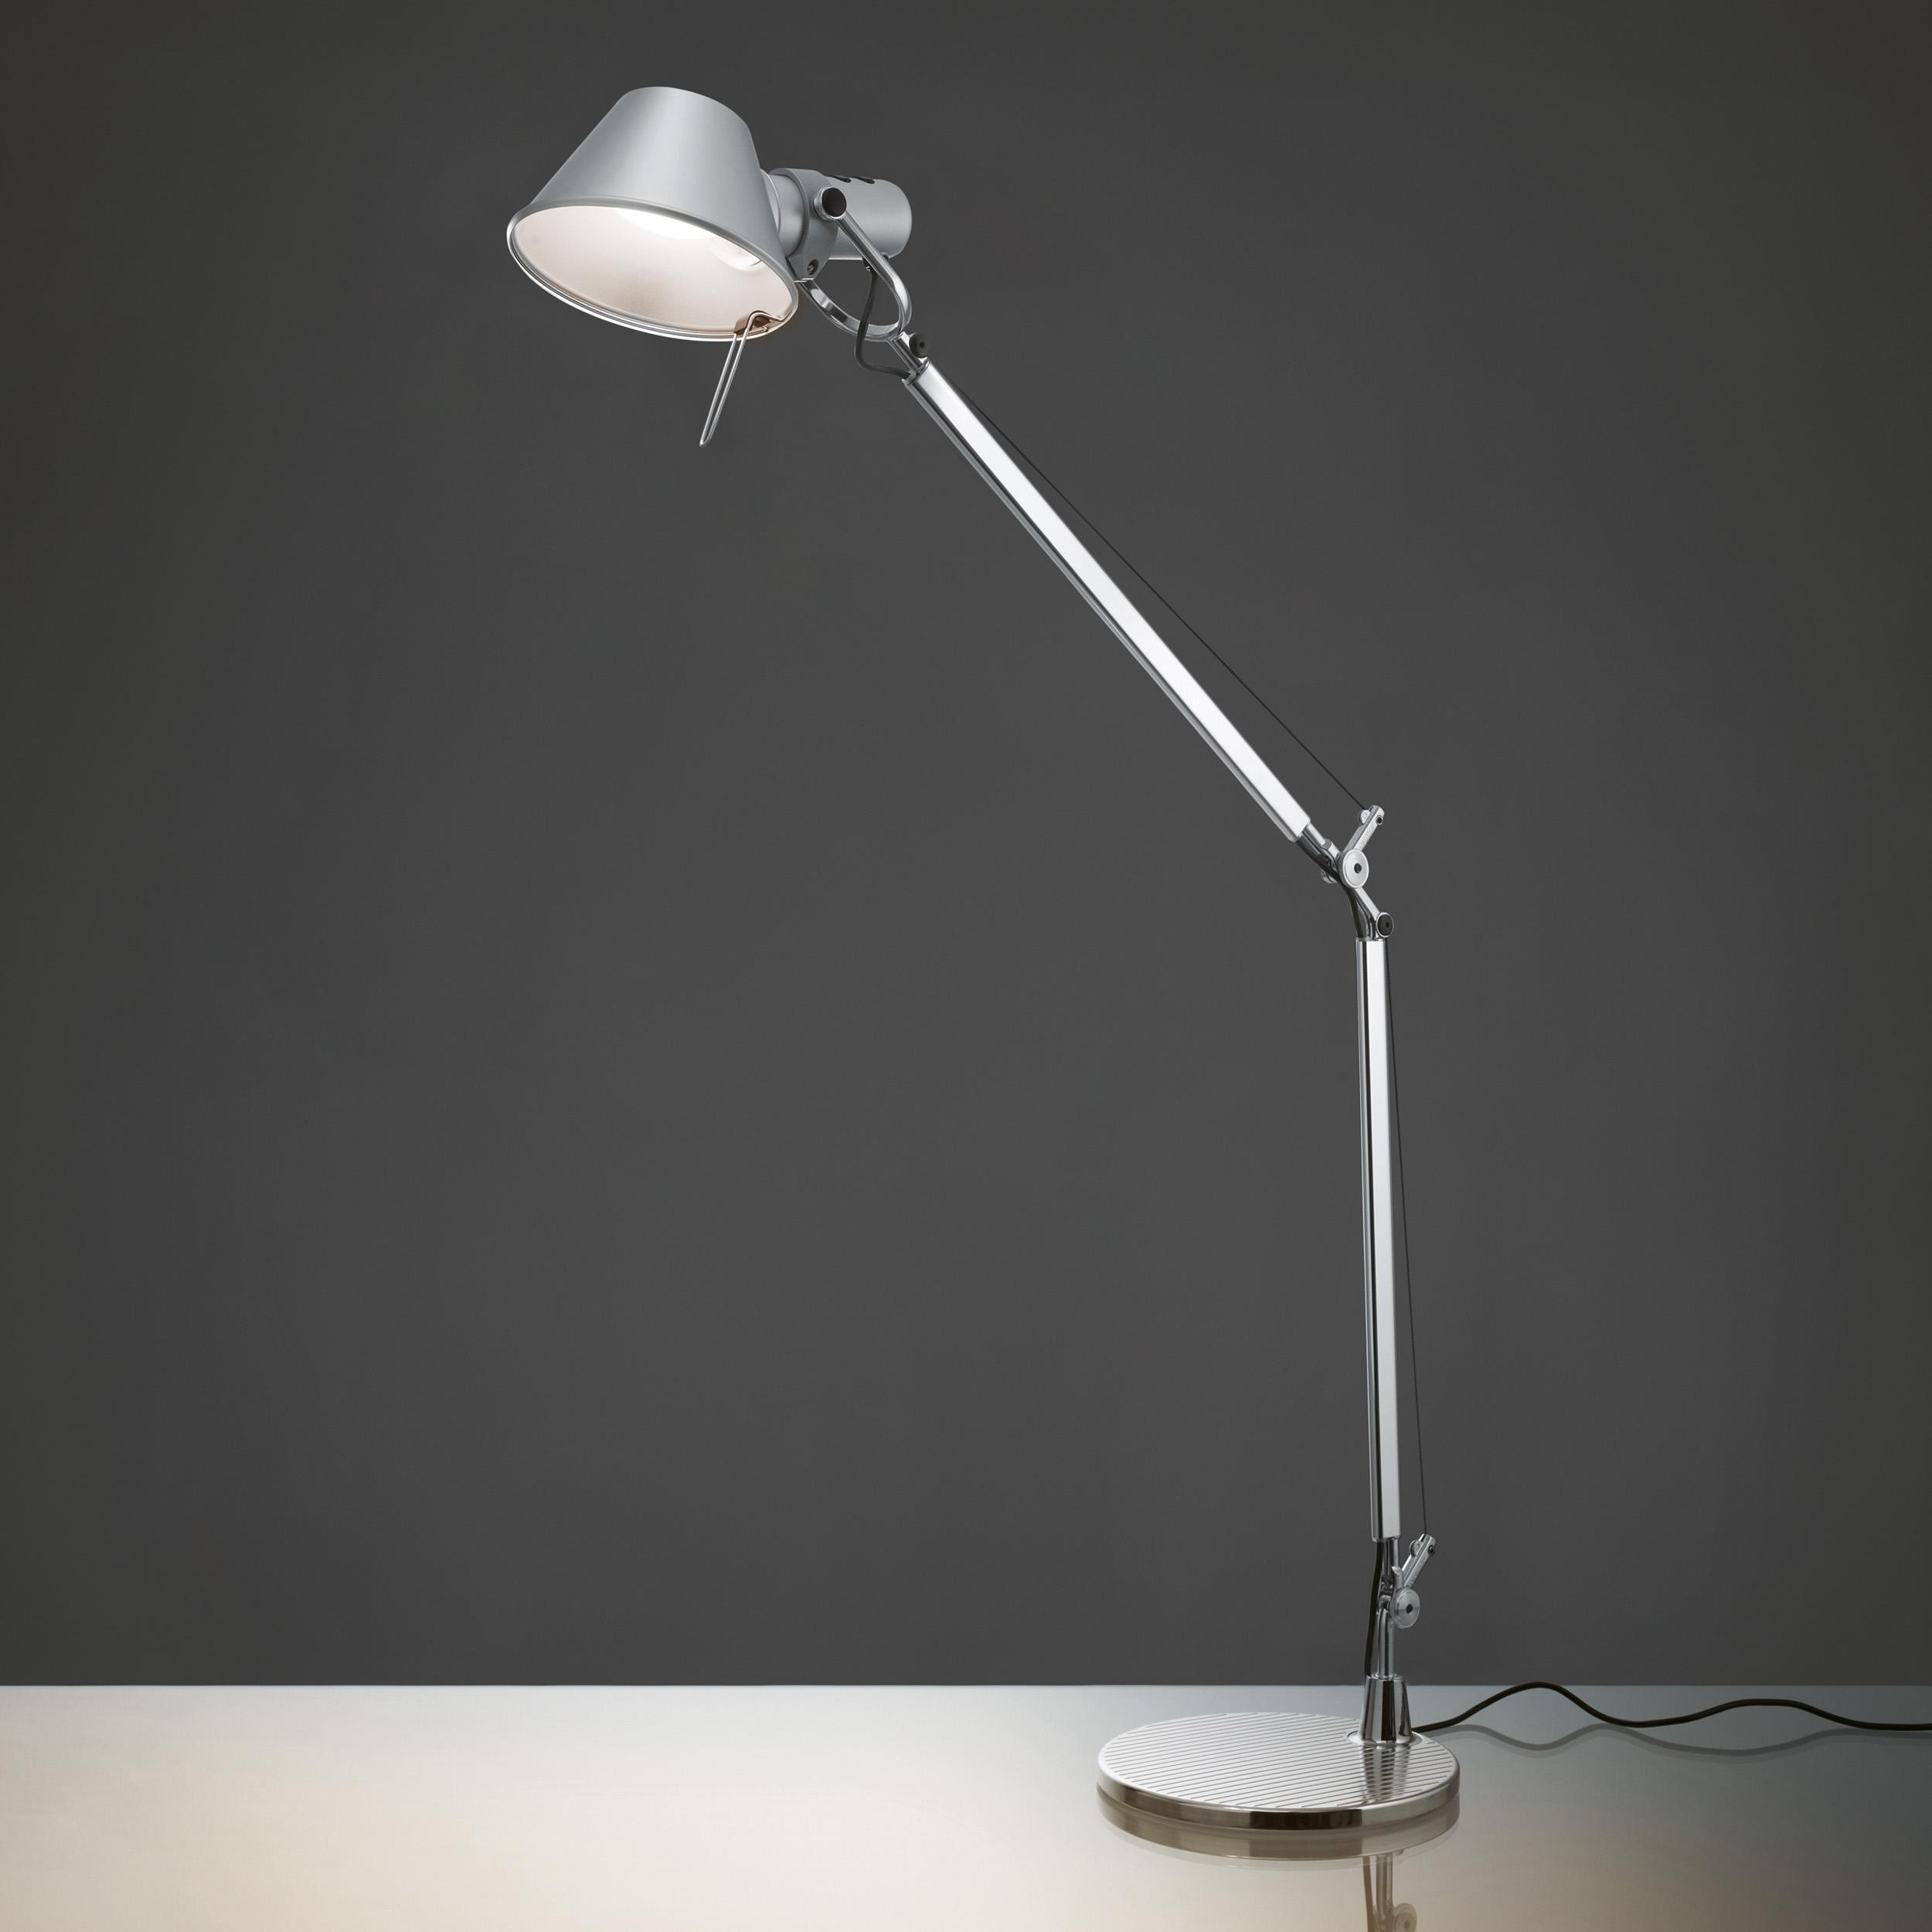 Buy The Tolomeo Mini Table Lamp All Square Lighting